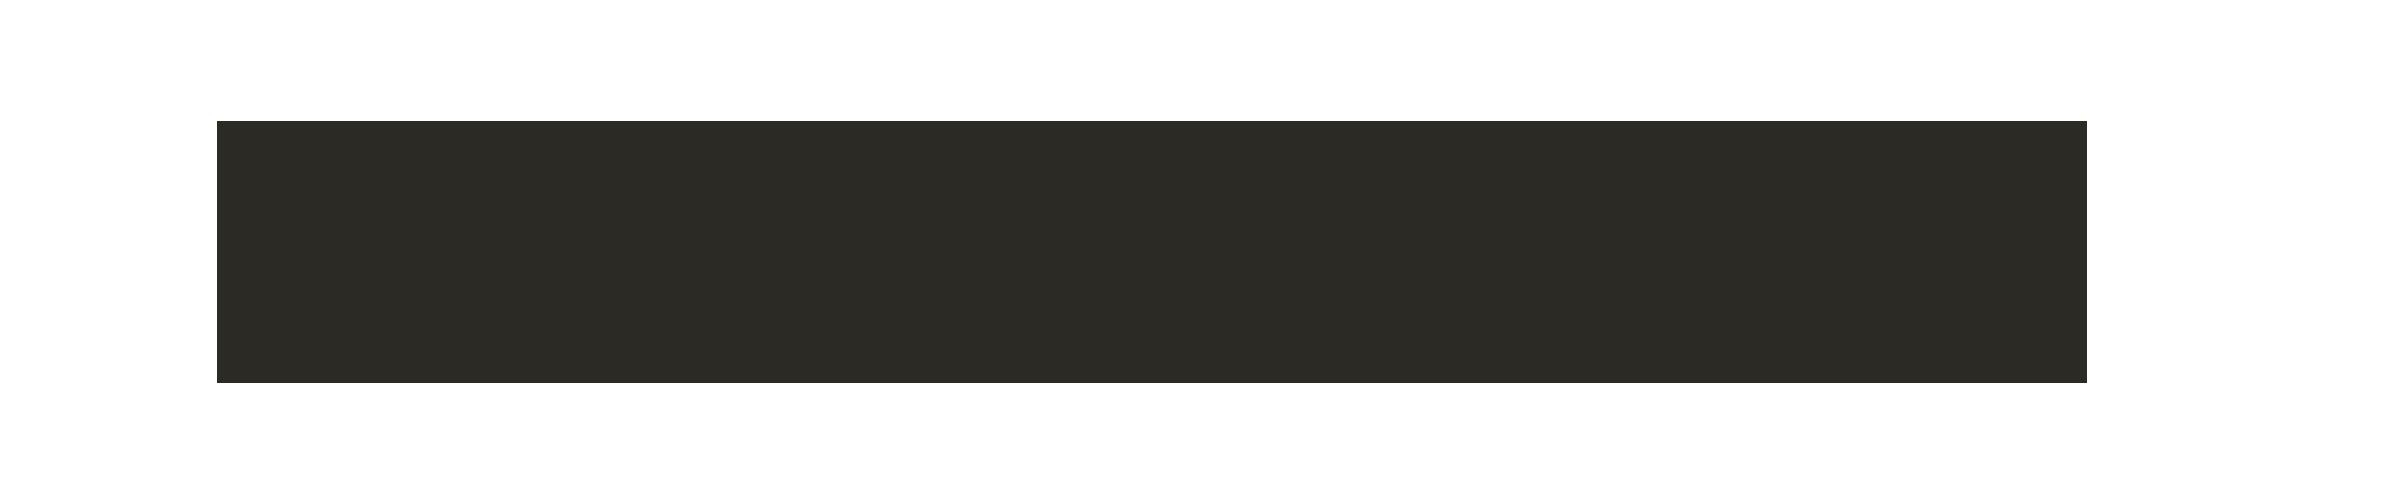 Uralkali logo